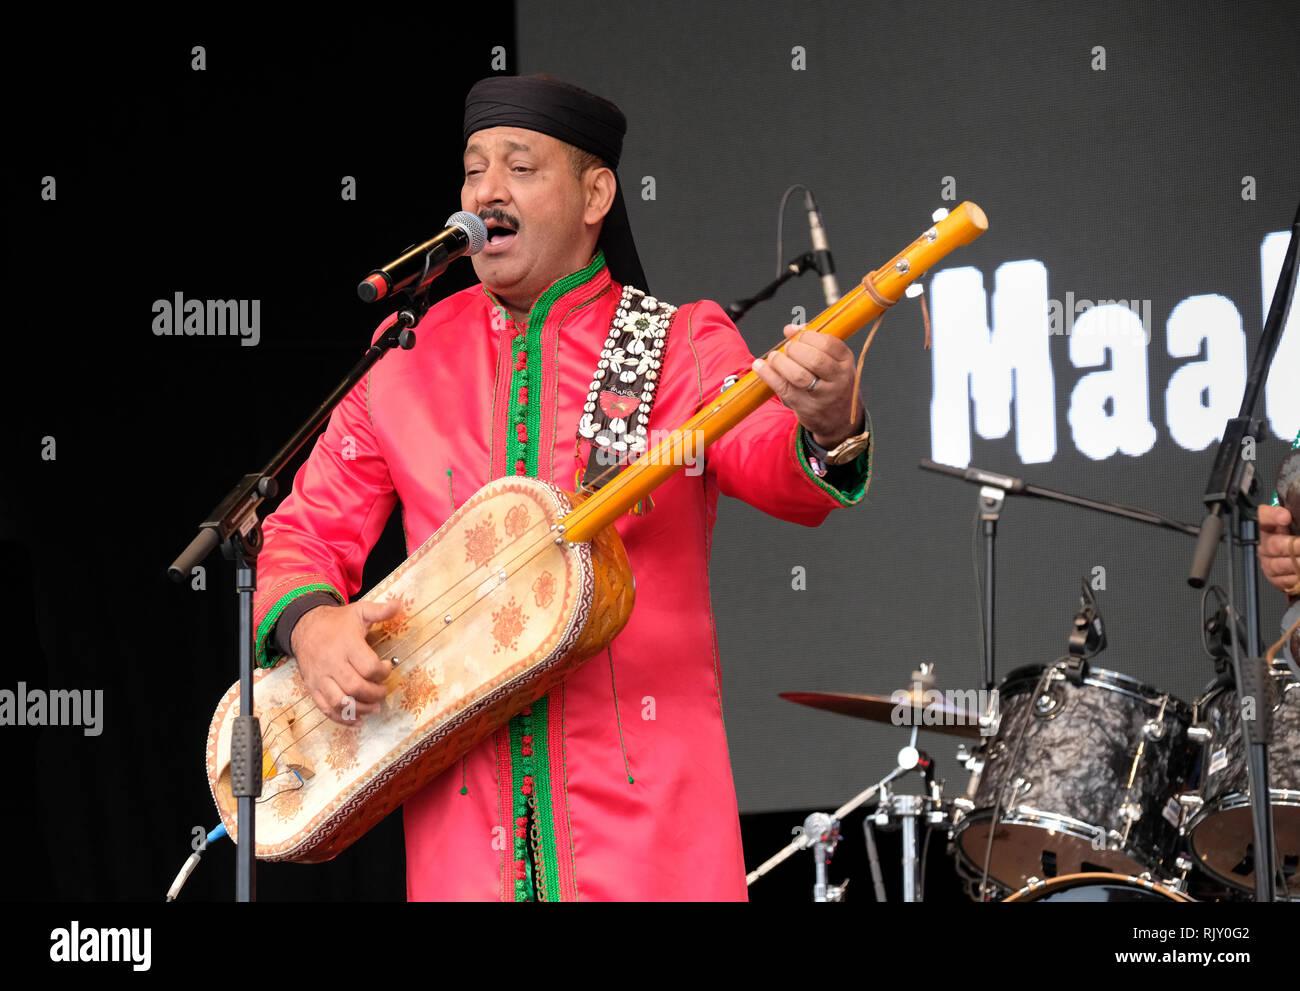 Maalem Hamid El Kasri performing at the WOMAD Festival, Charlton Park near Malmesbury, England, UK. July 28, 2018 - Stock Image